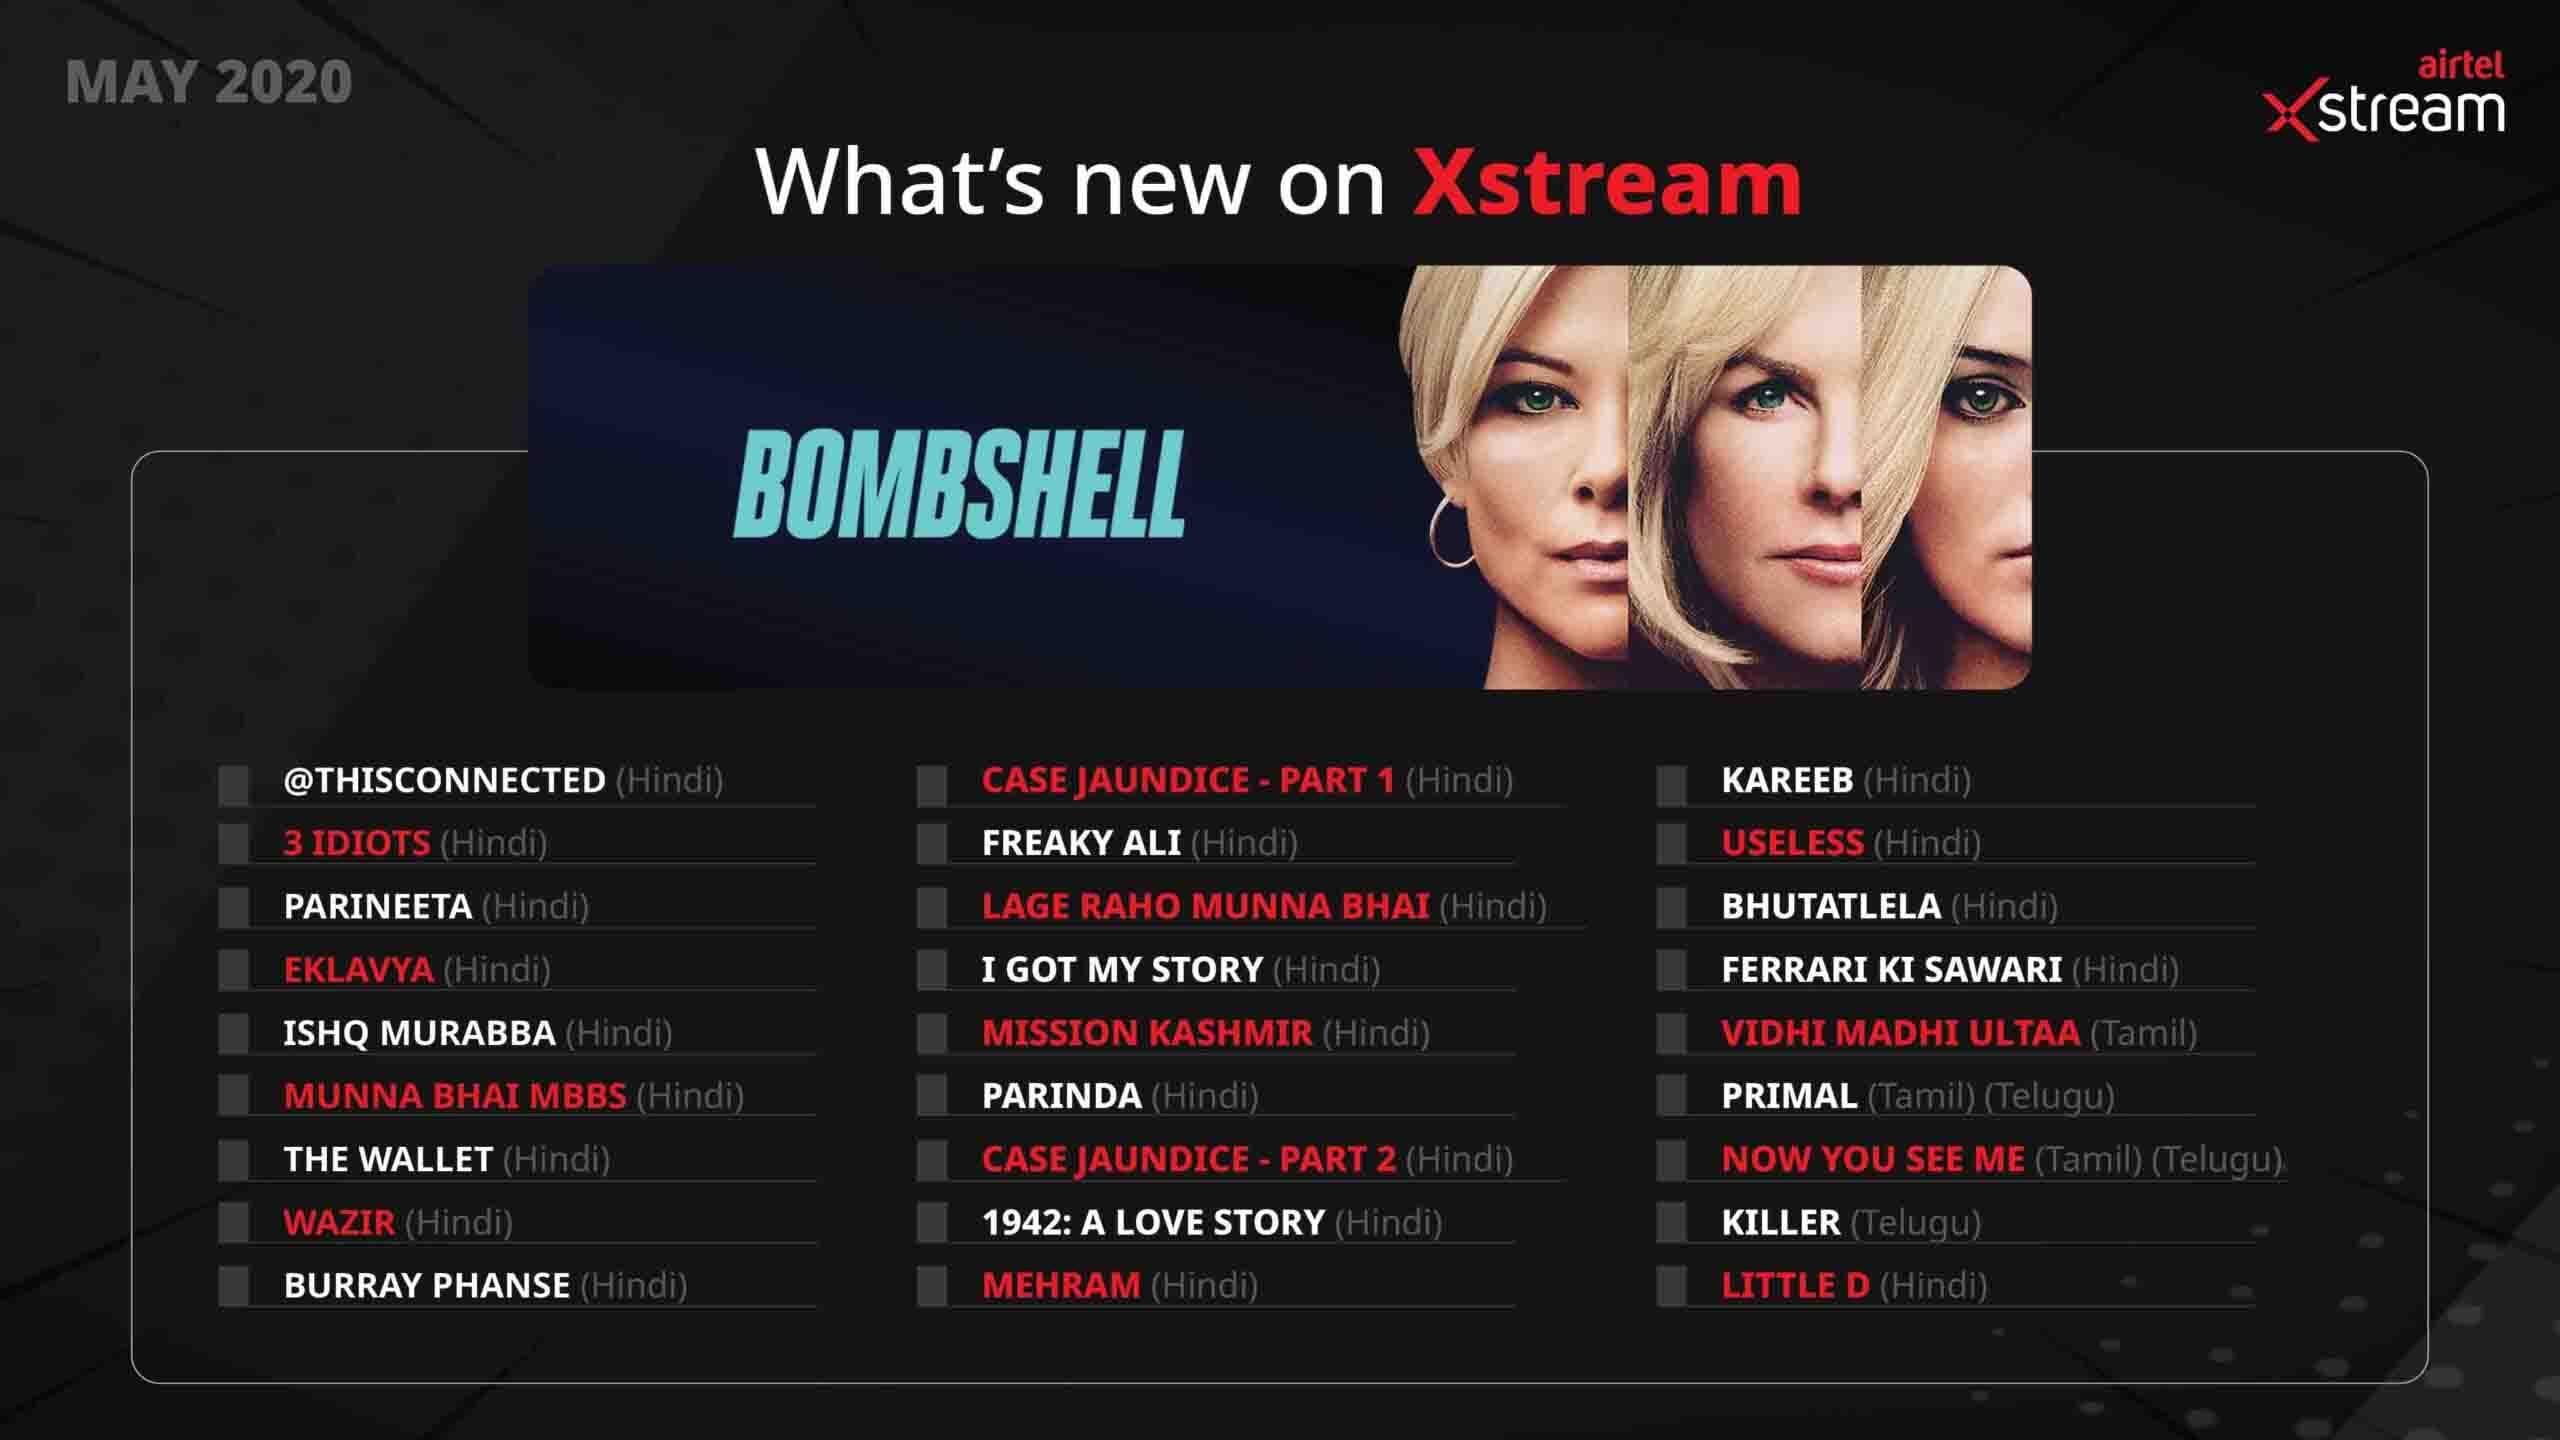 Whats New on Airtel Xstream 1